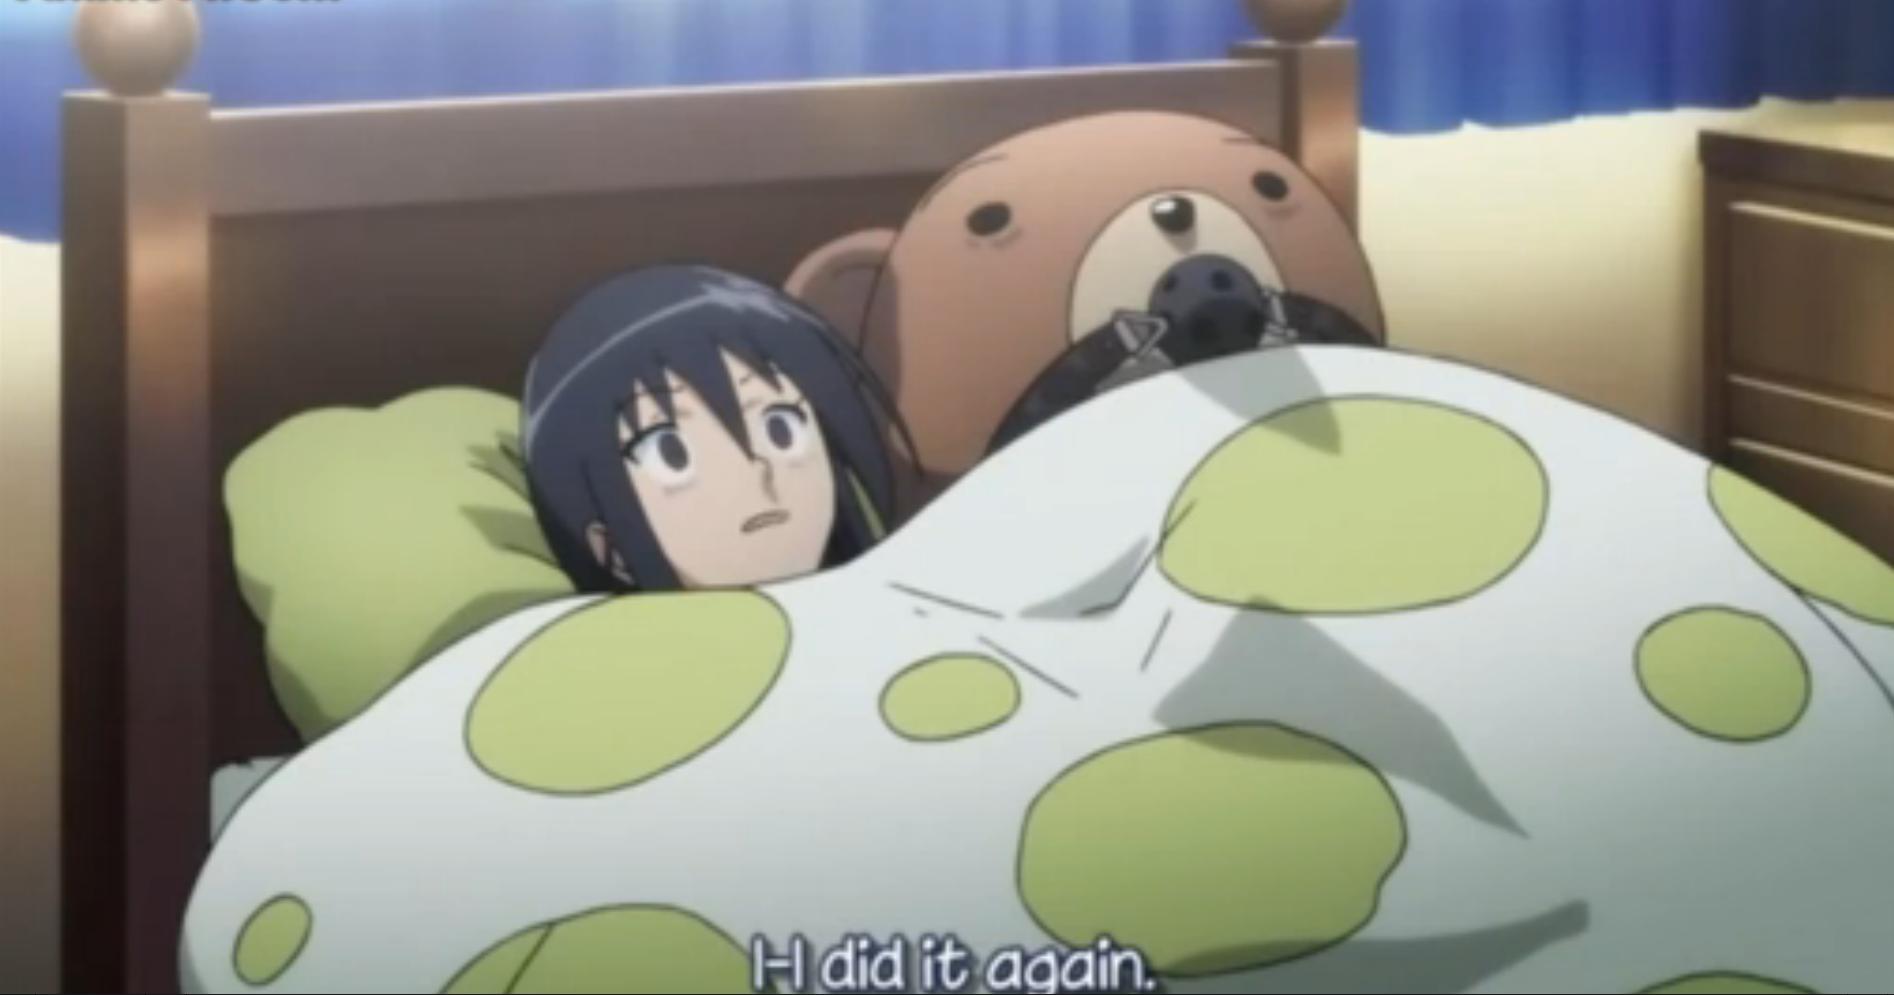 ohh anime. source is Seitokai Yakuindomo.. The greatest teddy ever.